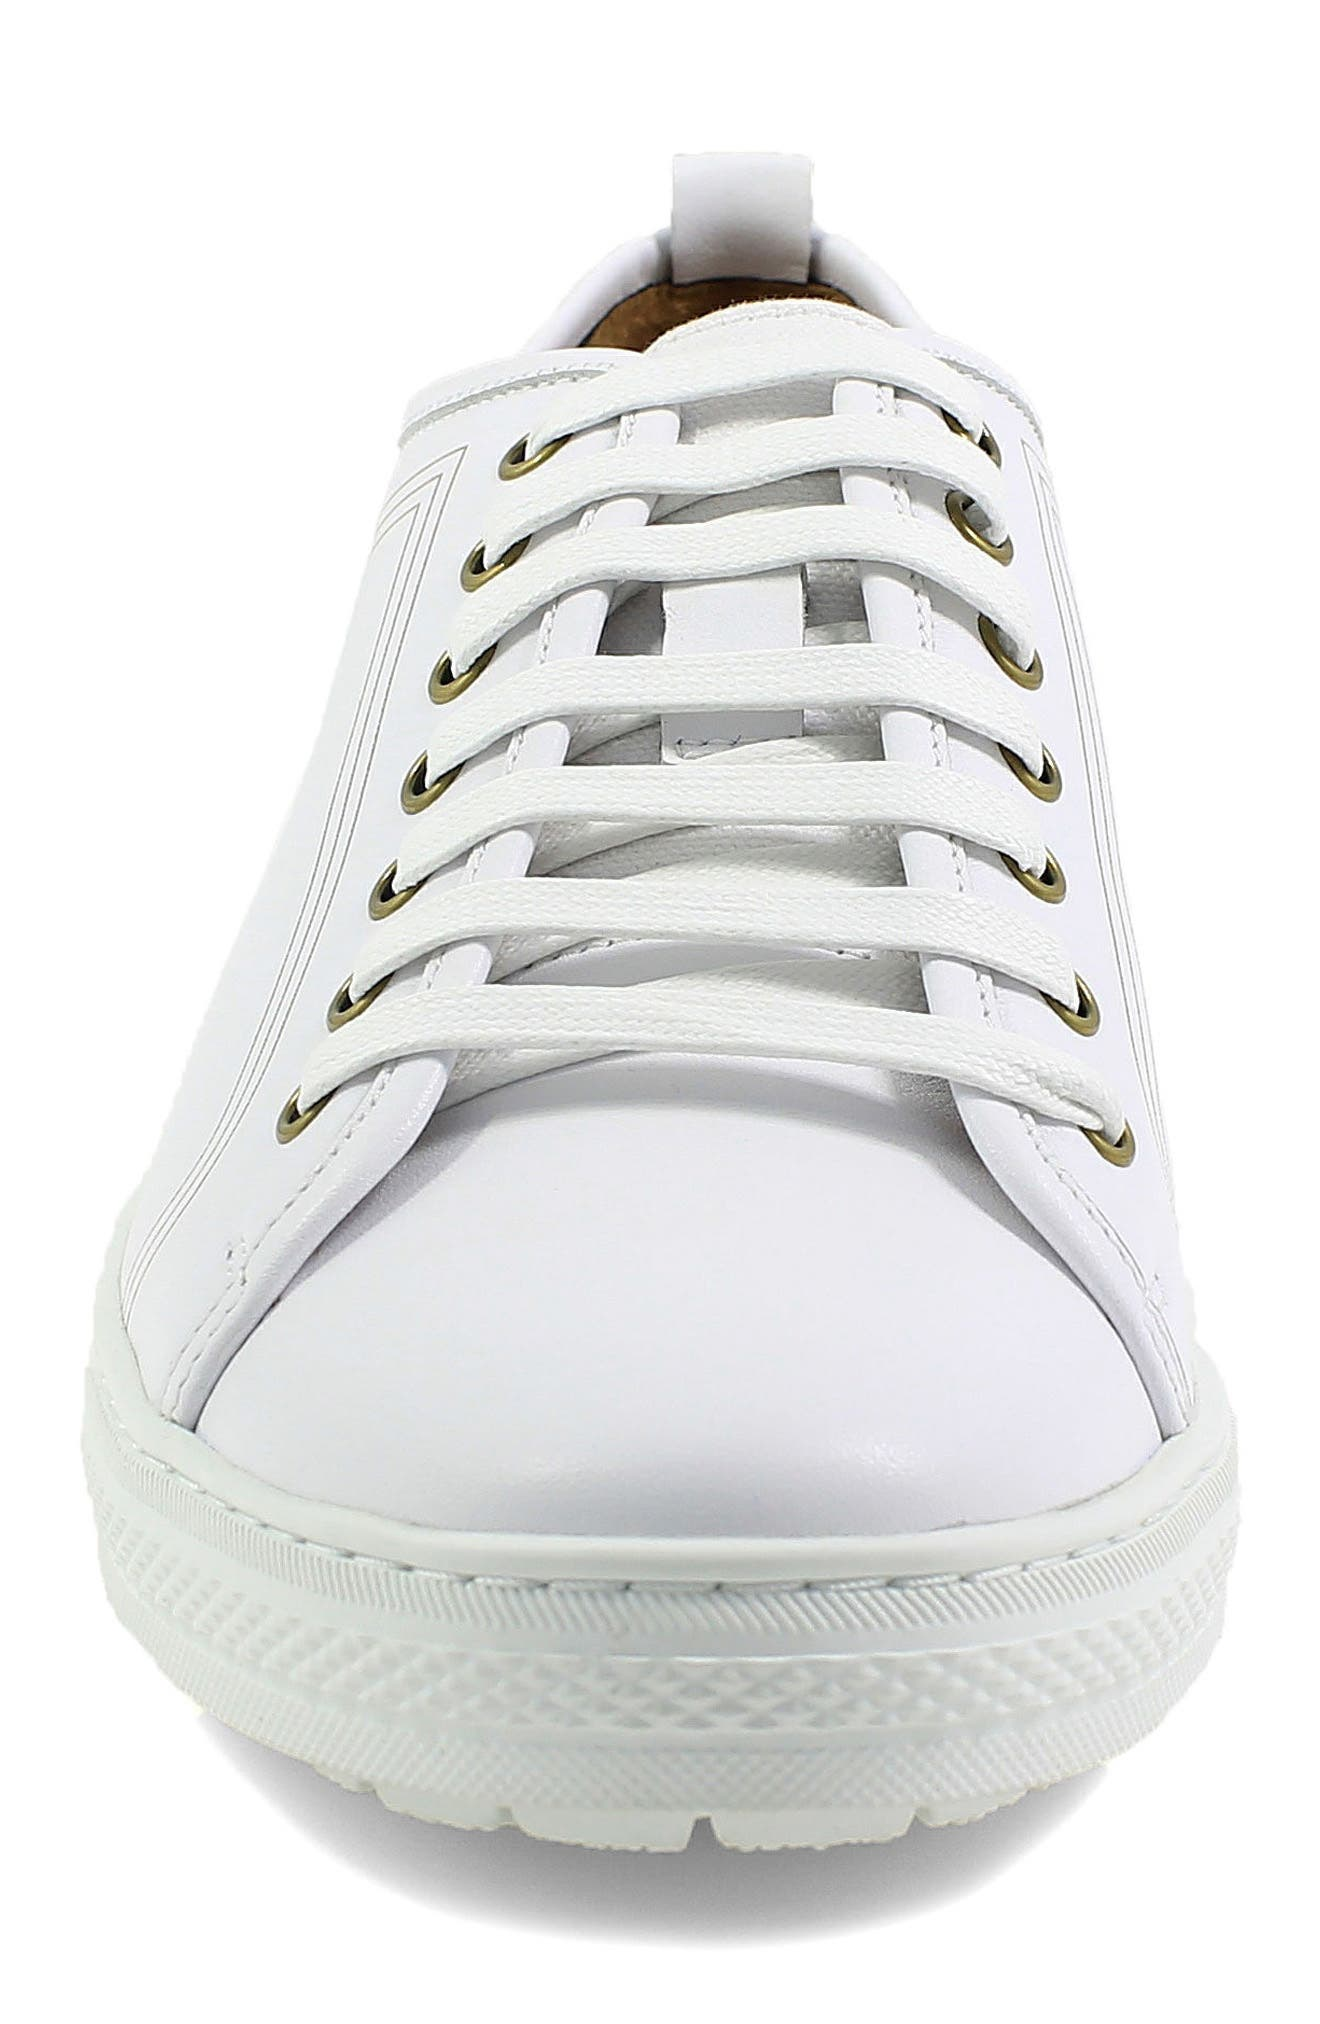 Forward Lo Sneaker,                             Alternate thumbnail 18, color,